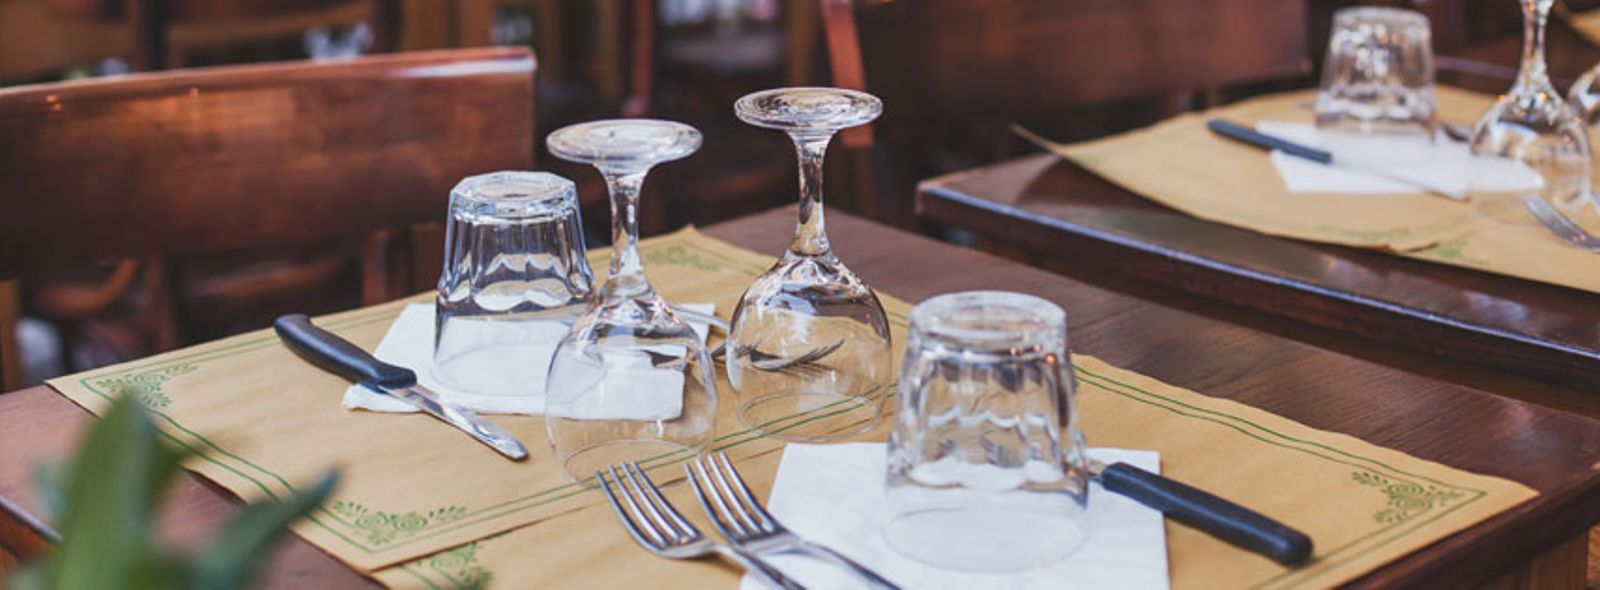 Ristoranti slow food Milano